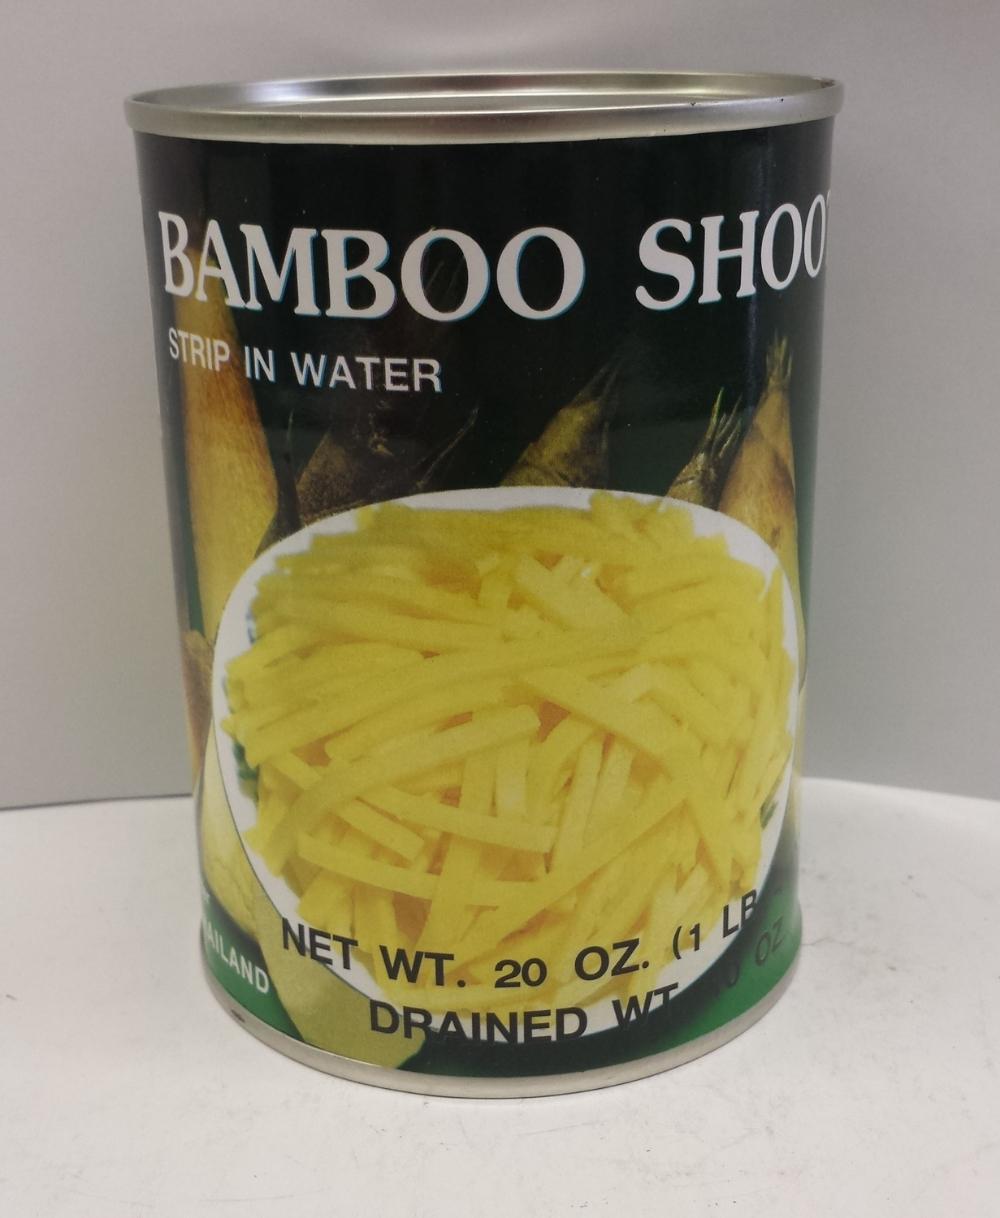 Bamboo Shoot, Strip in Water    Singing Bird    BBS1109 24x20 oz    BBS1110 6x5 lbs